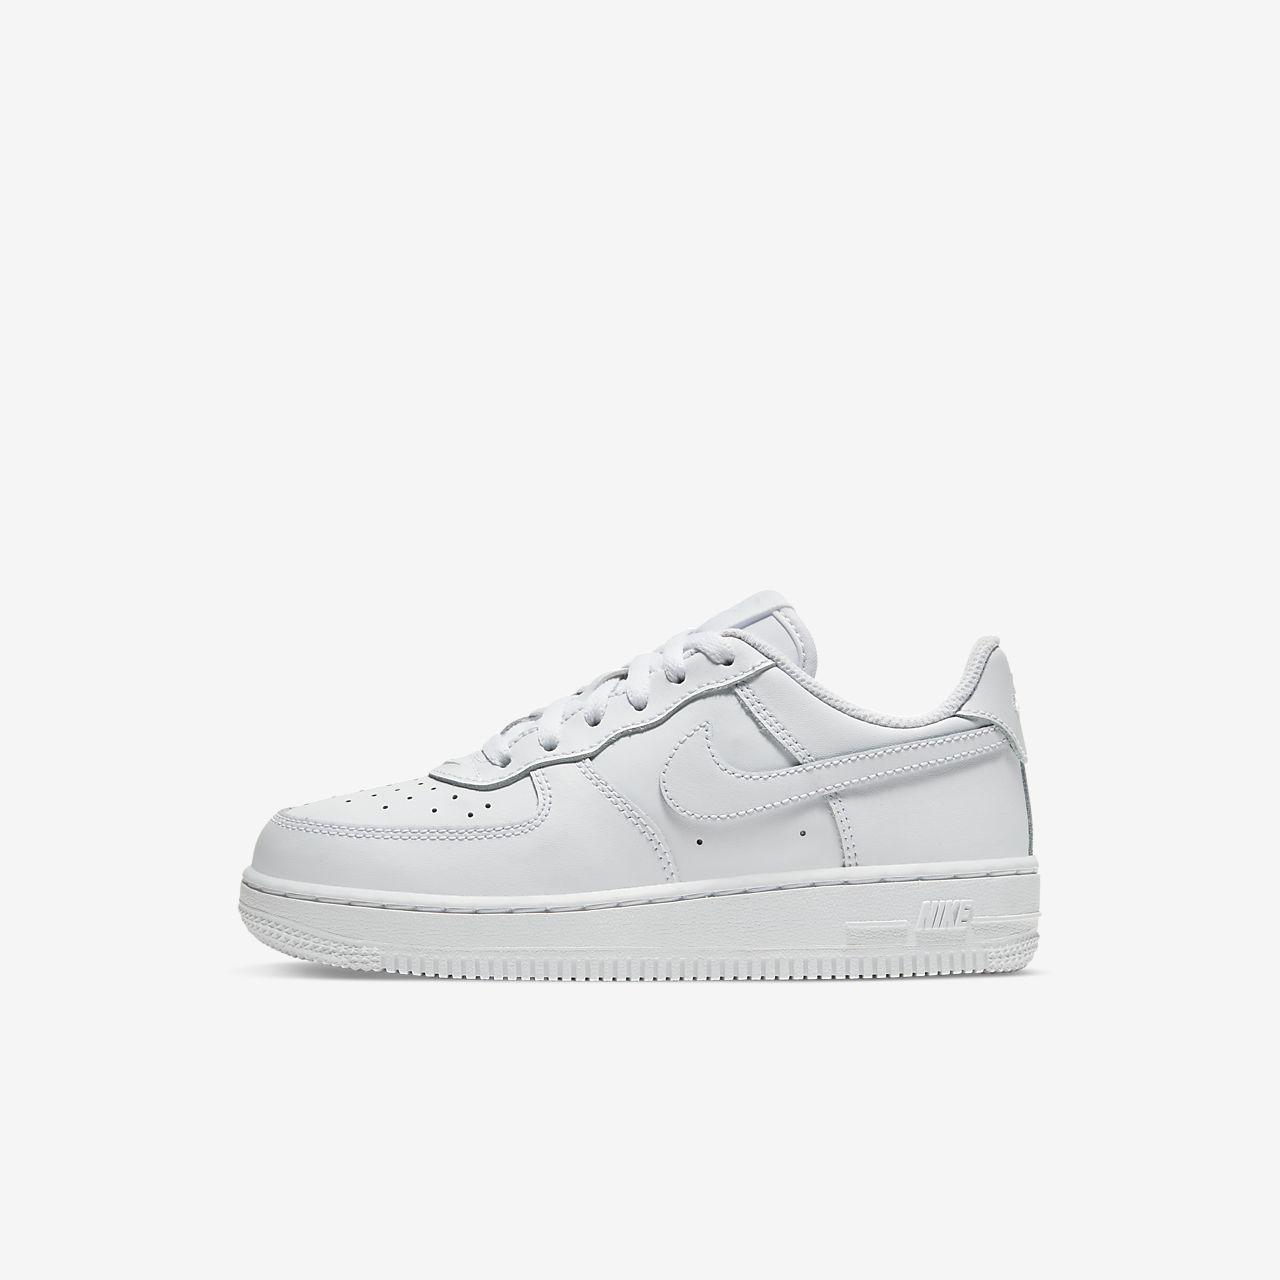 timeless design 2d4aa 04383 ... Calzado para niños talla pequeña Nike Air Force 1